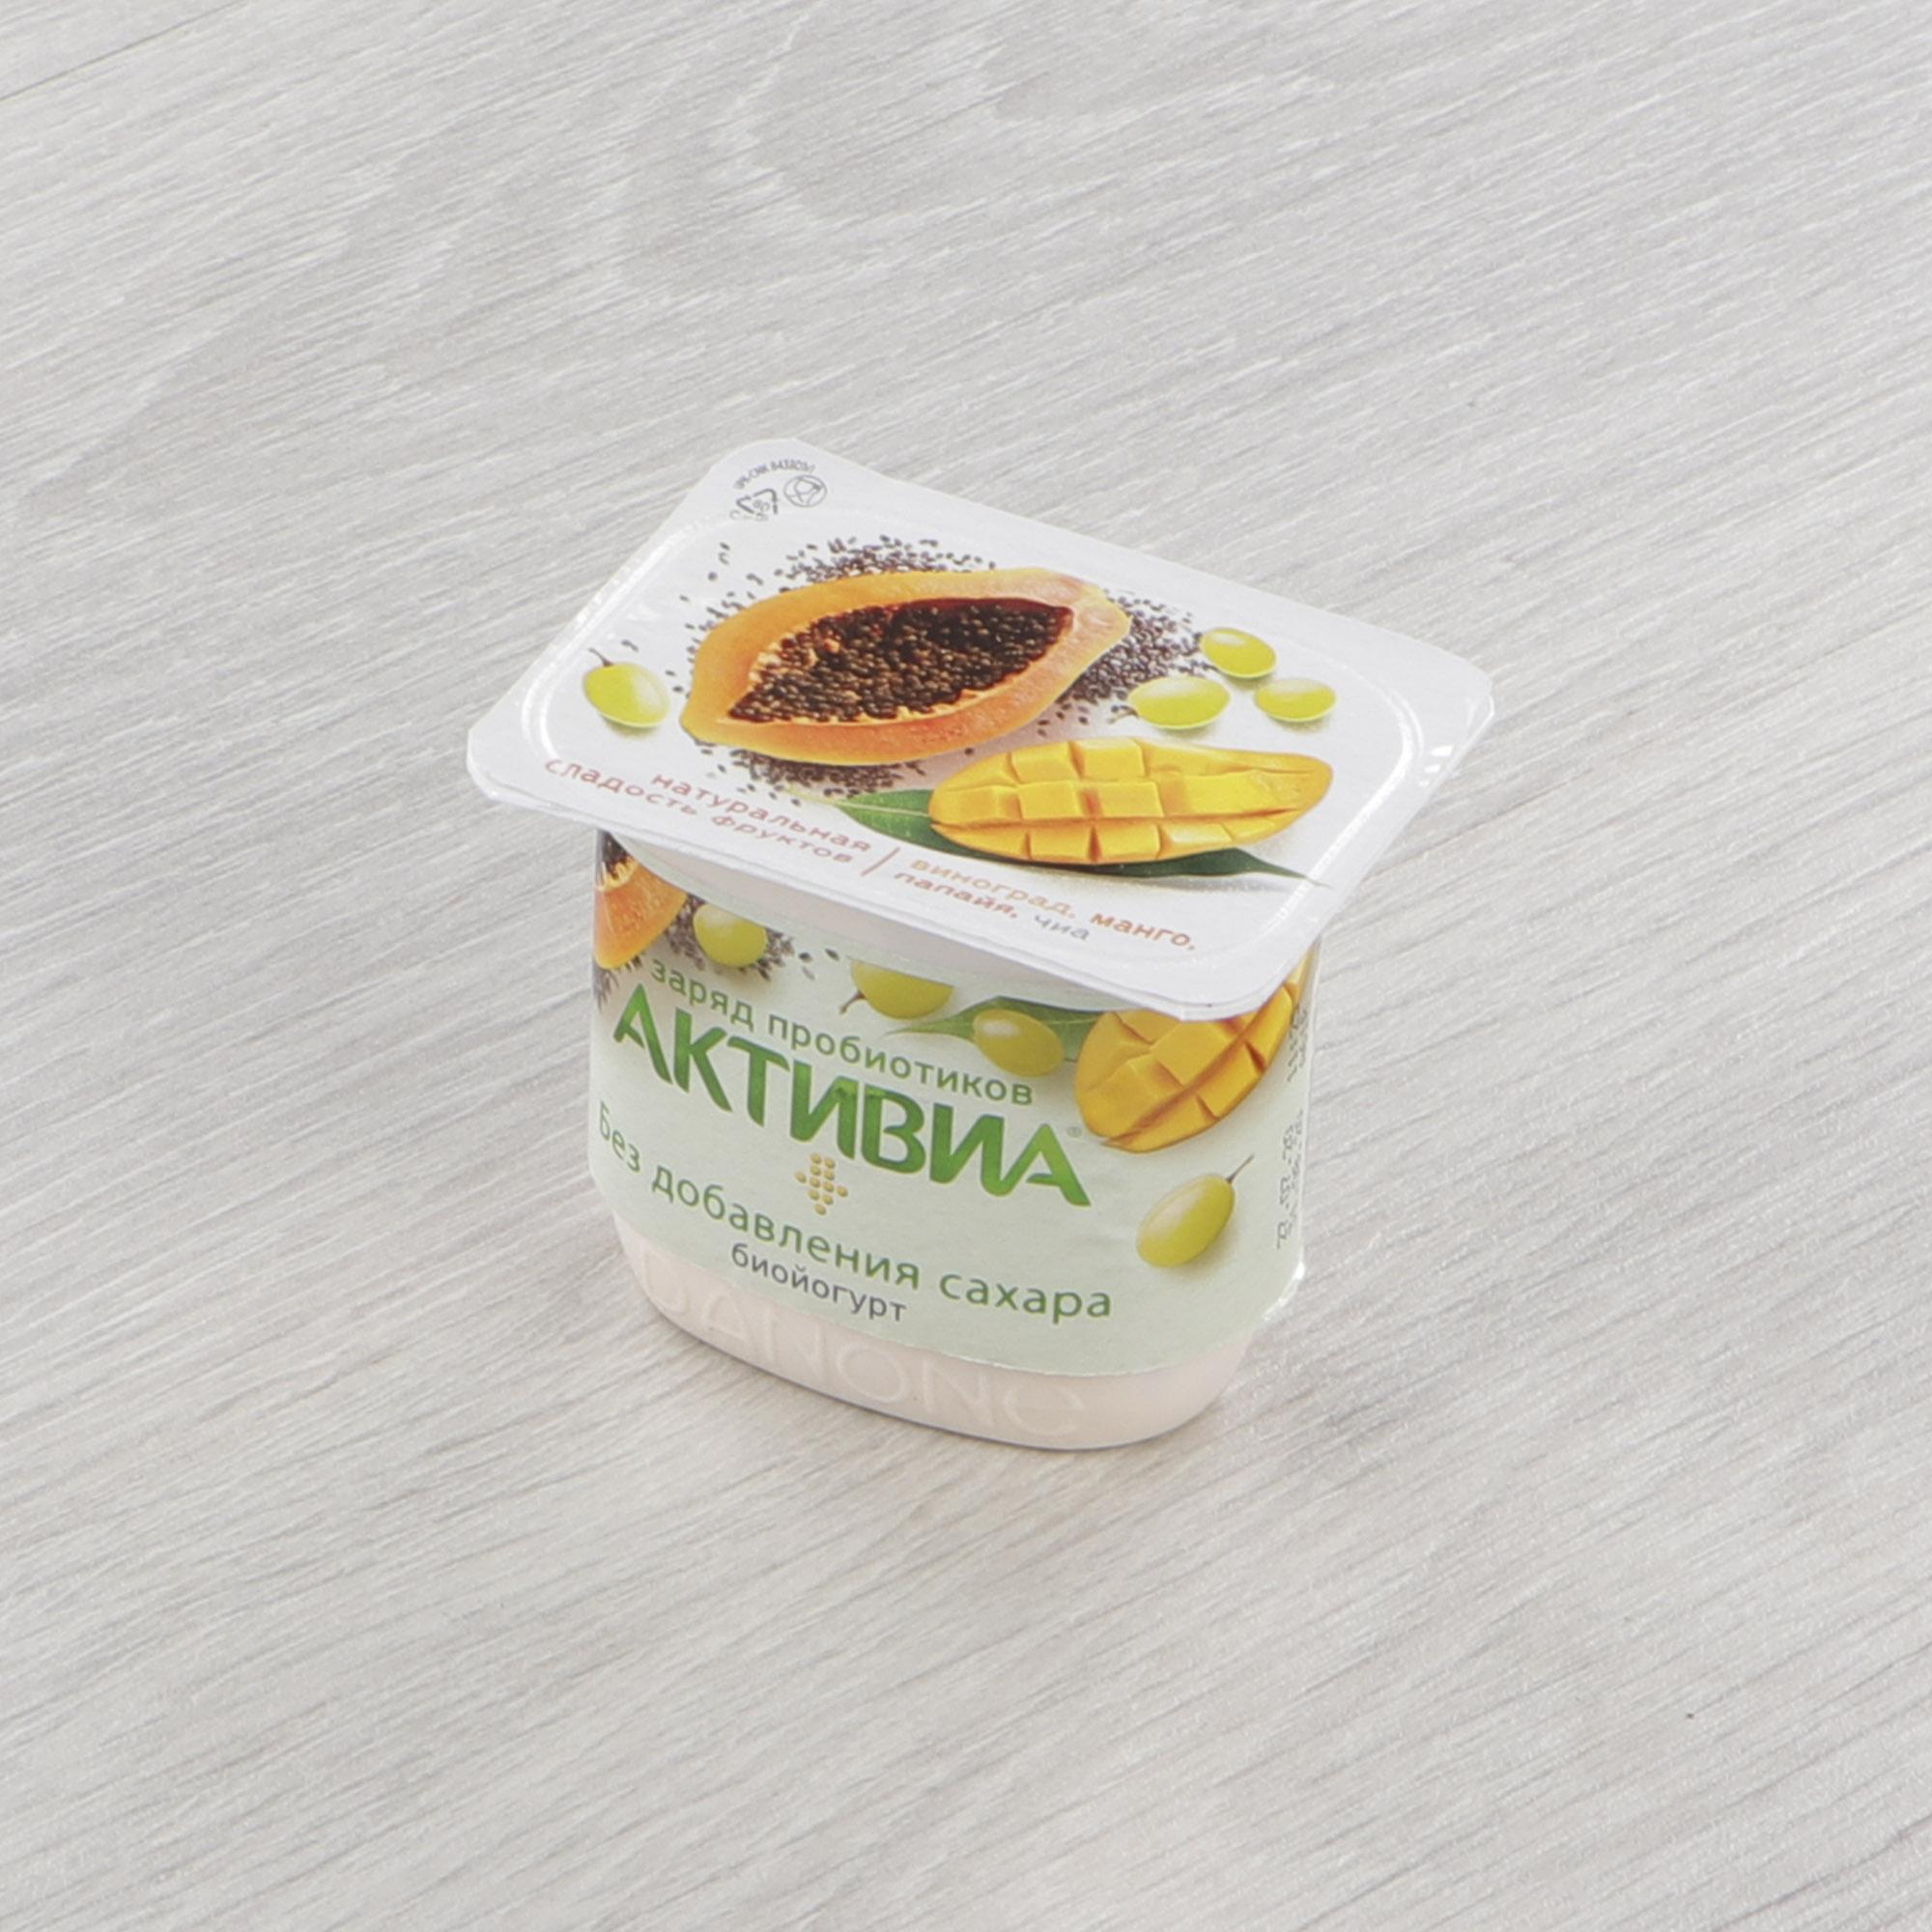 Биойогурт Активиа виноград, манго, папайя, чиа 150 г биойогурт активиа цитрусовый микс киноа 2 9% 150 г